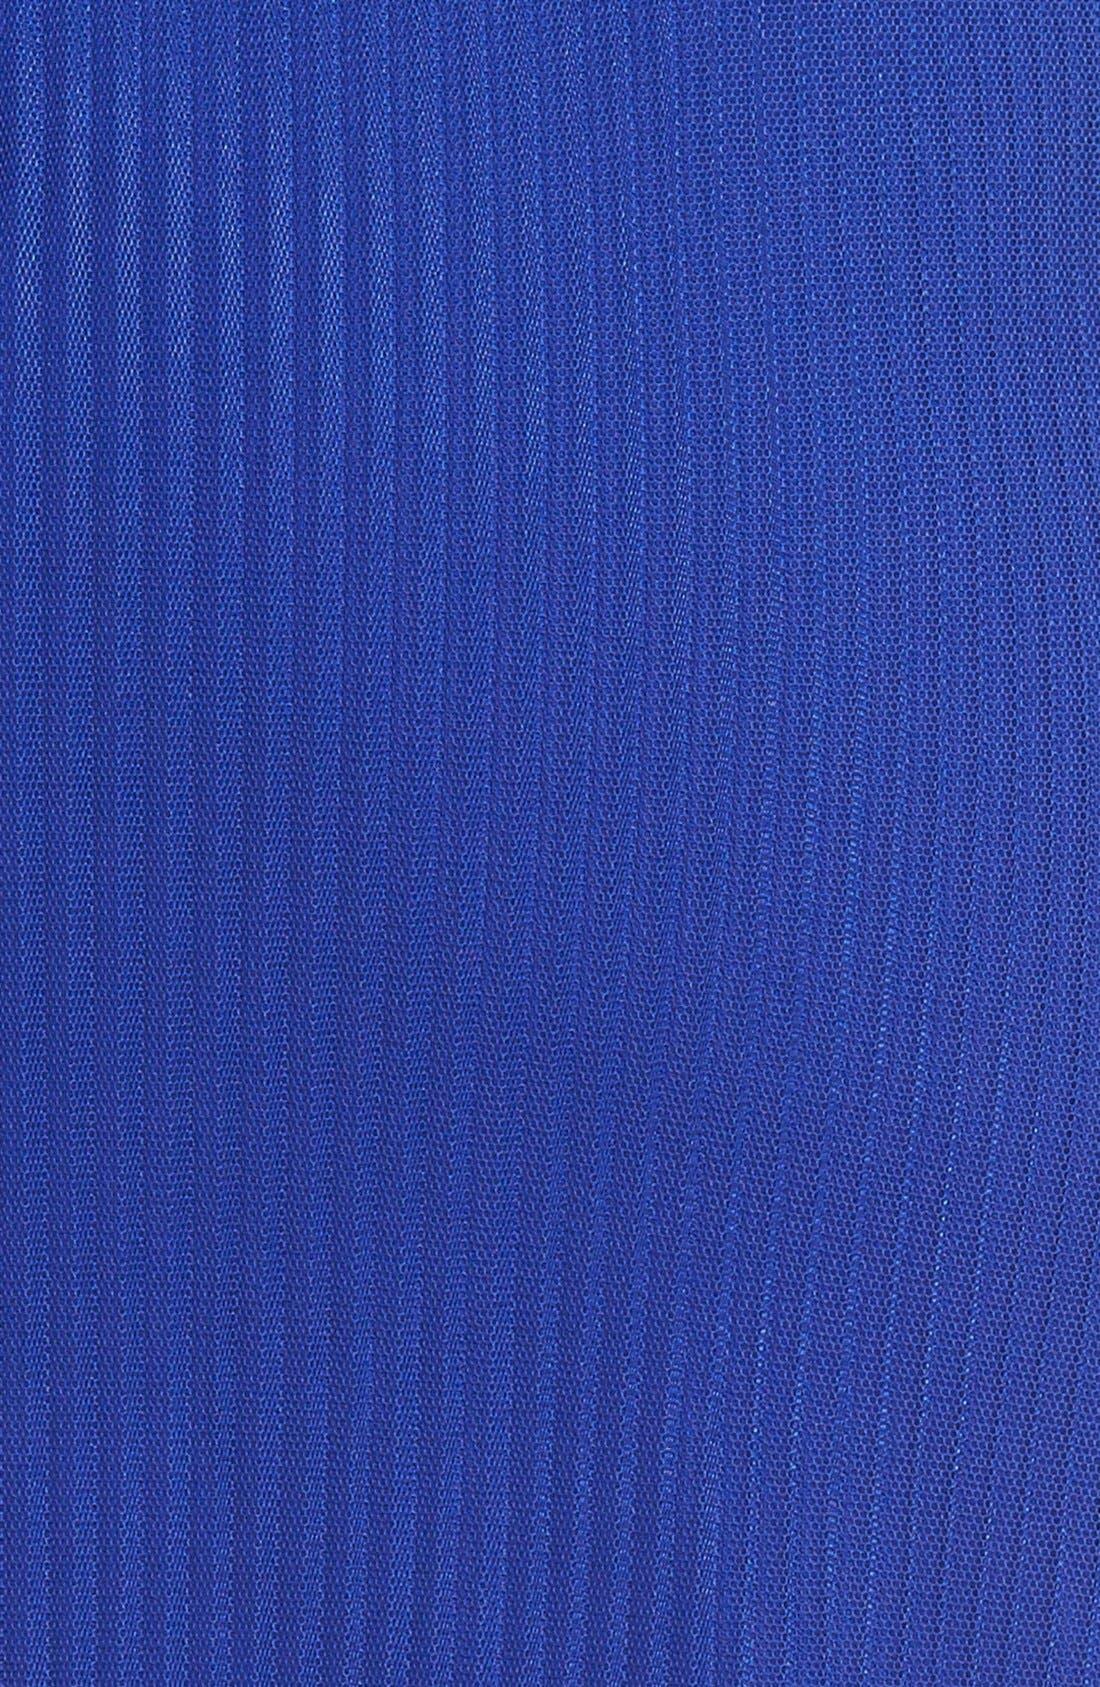 Alternate Image 3  - BOSS 'Veplyti' Plissé Overlay Pencil Skirt